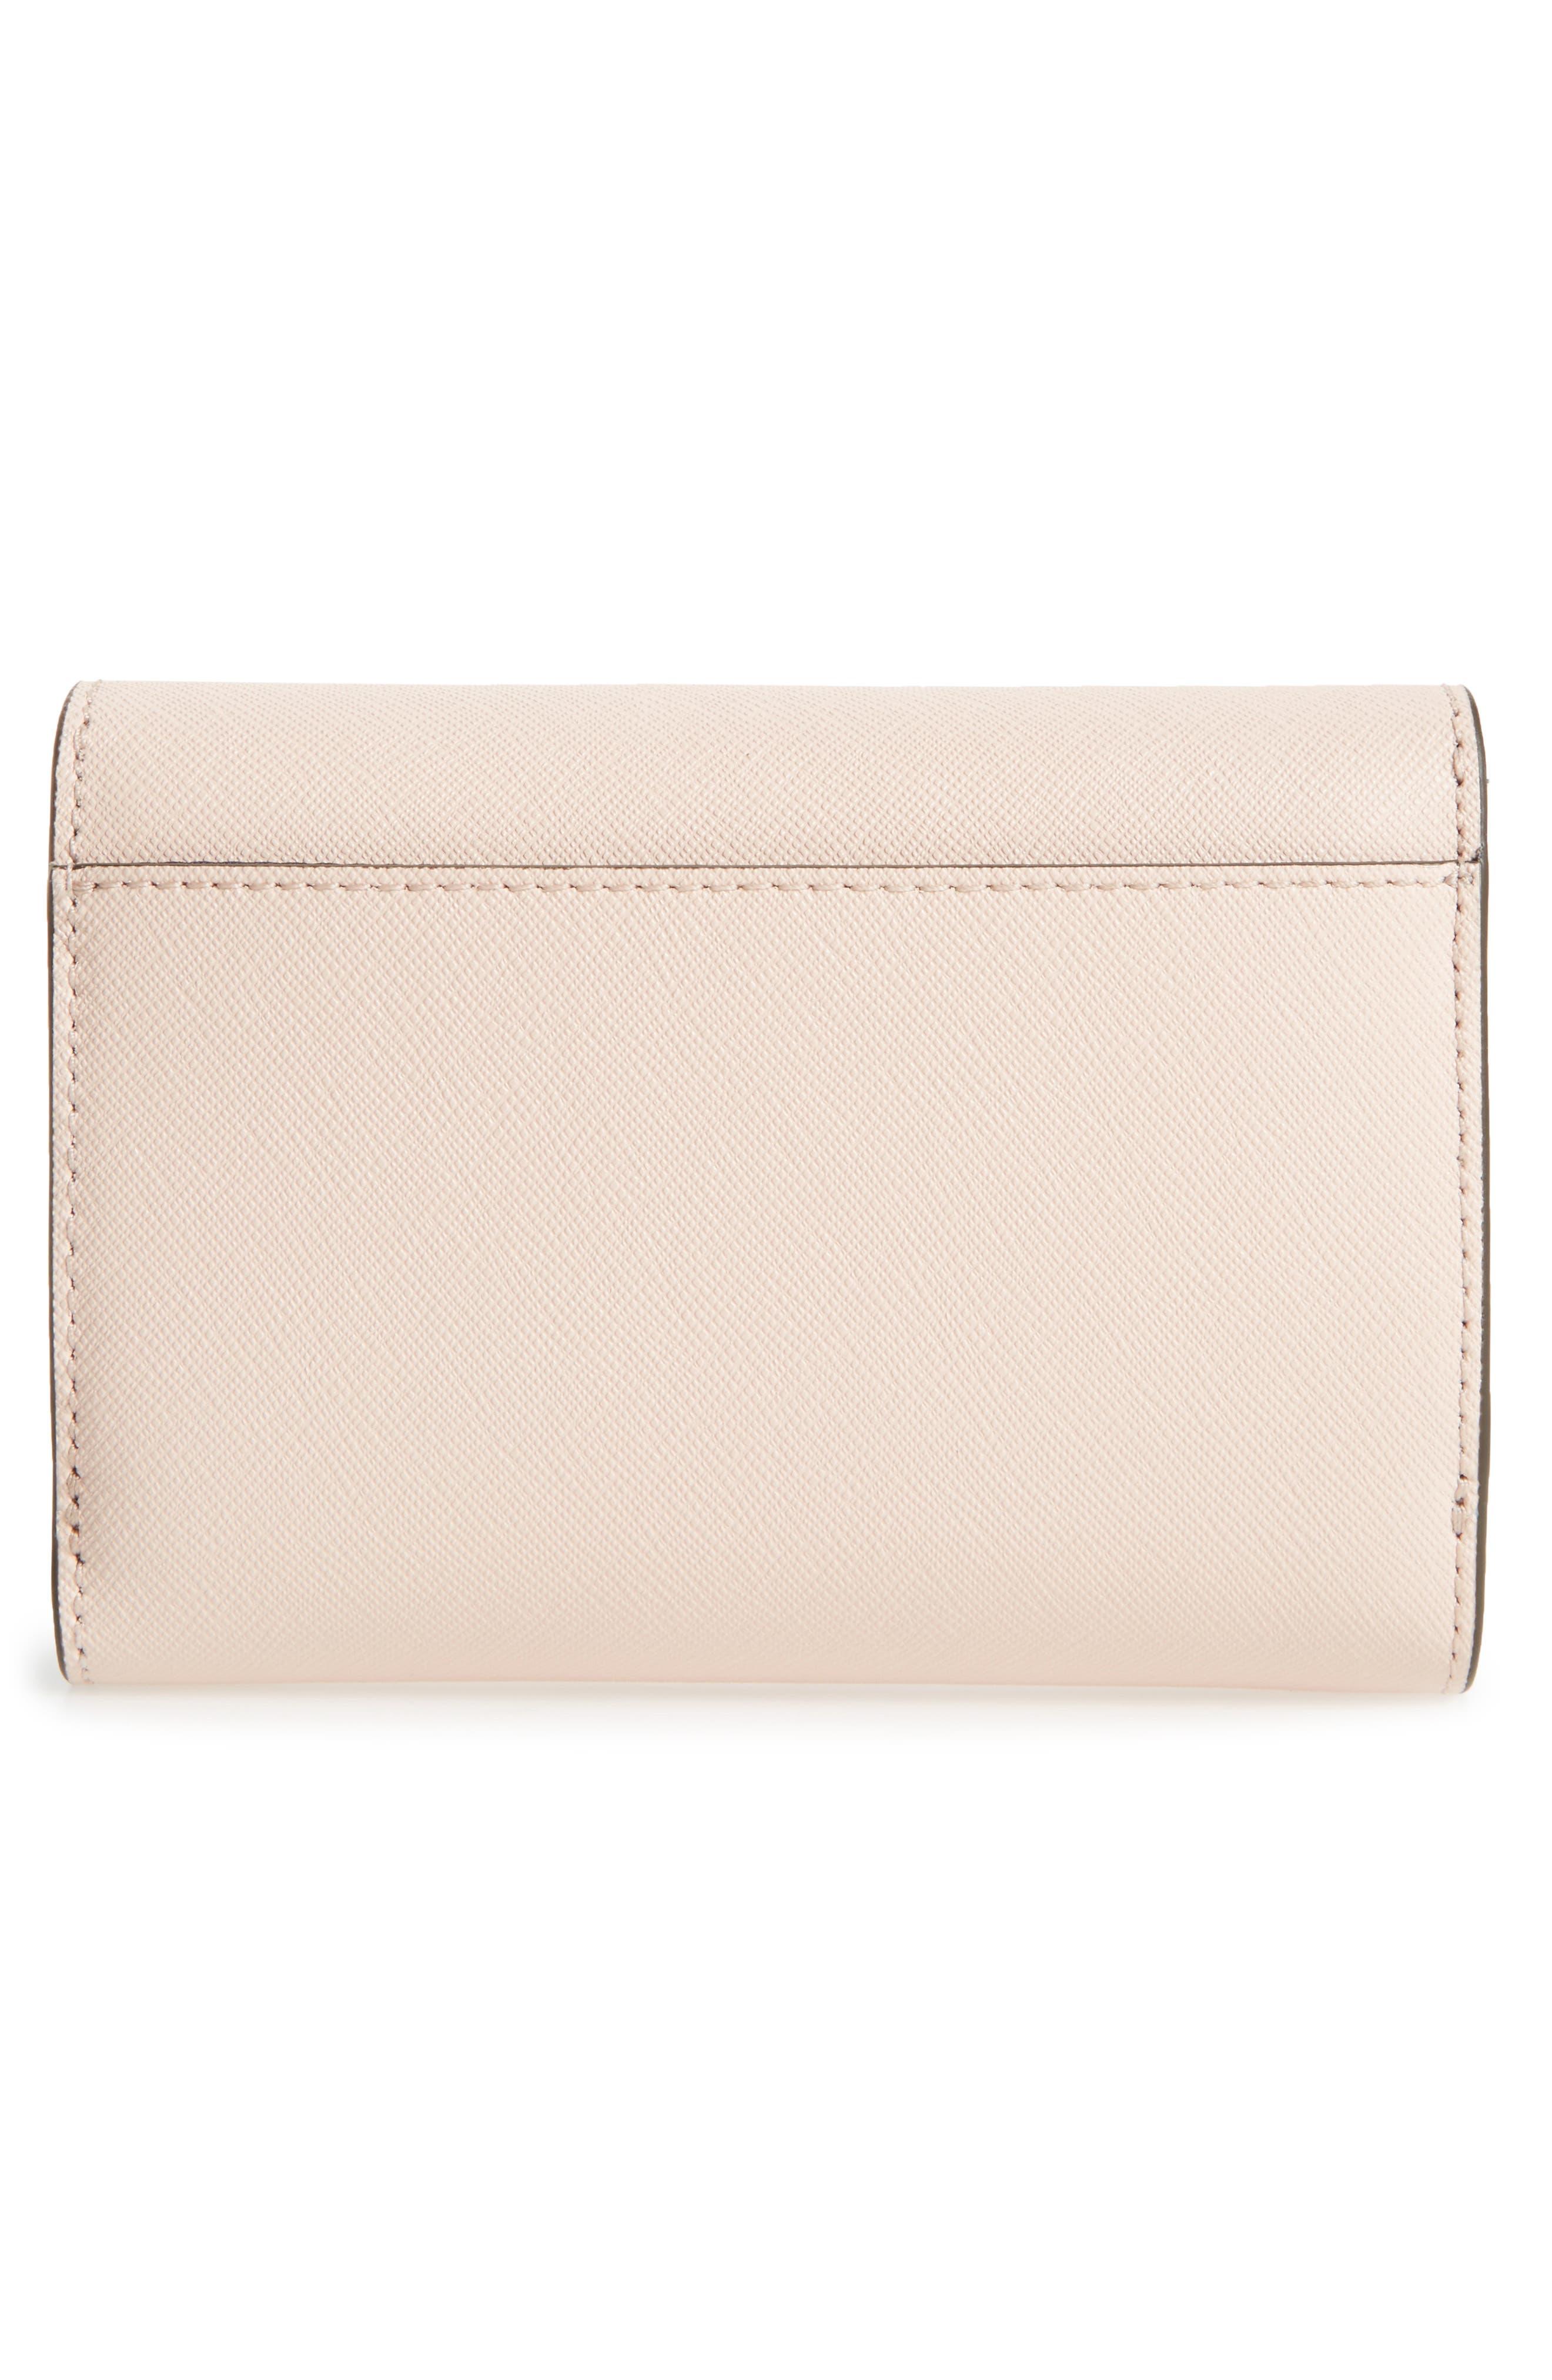 Robinson Medium Leather Wallet,                             Alternate thumbnail 4, color,                             Pale Apricot / Royal Navy